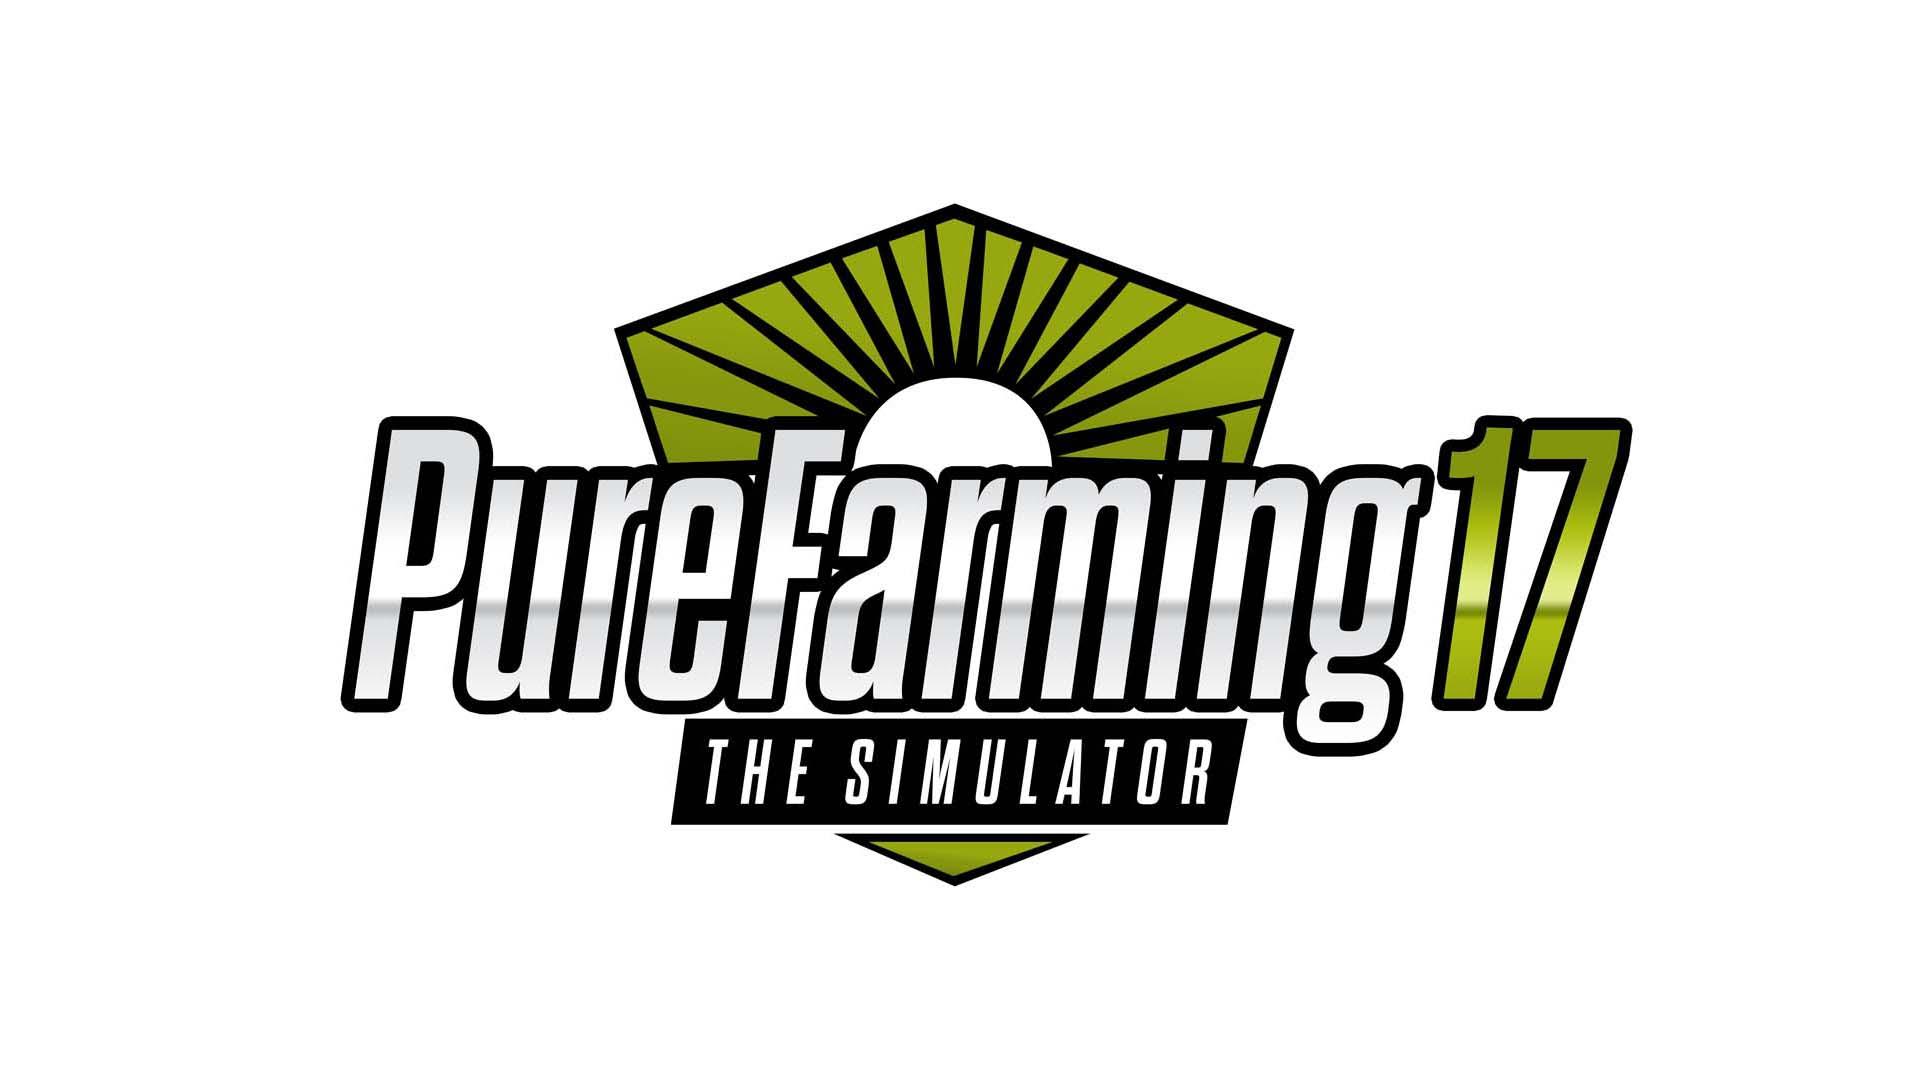 Pure_Farming_17_The_Simulator_logo